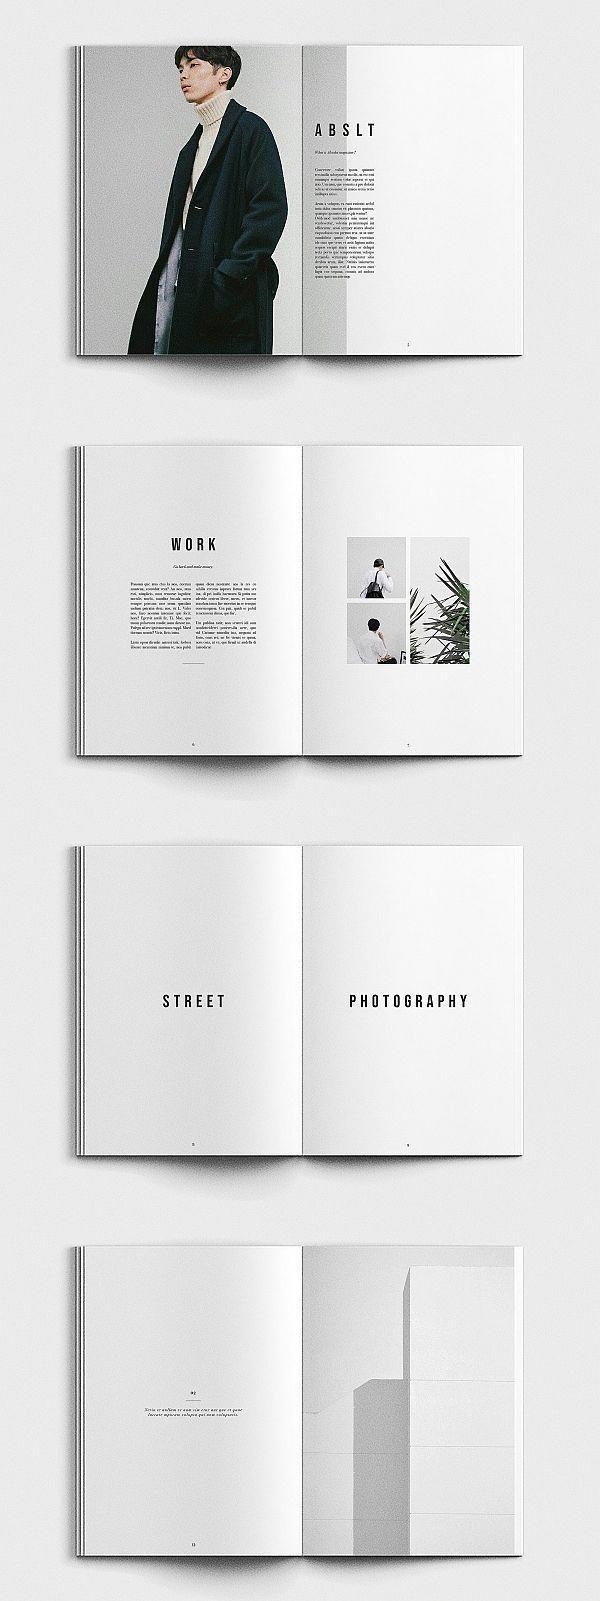 ABSOLUT Photography Portfolio Template #portfolio #lookbook #brochure #template #brochuretemplates